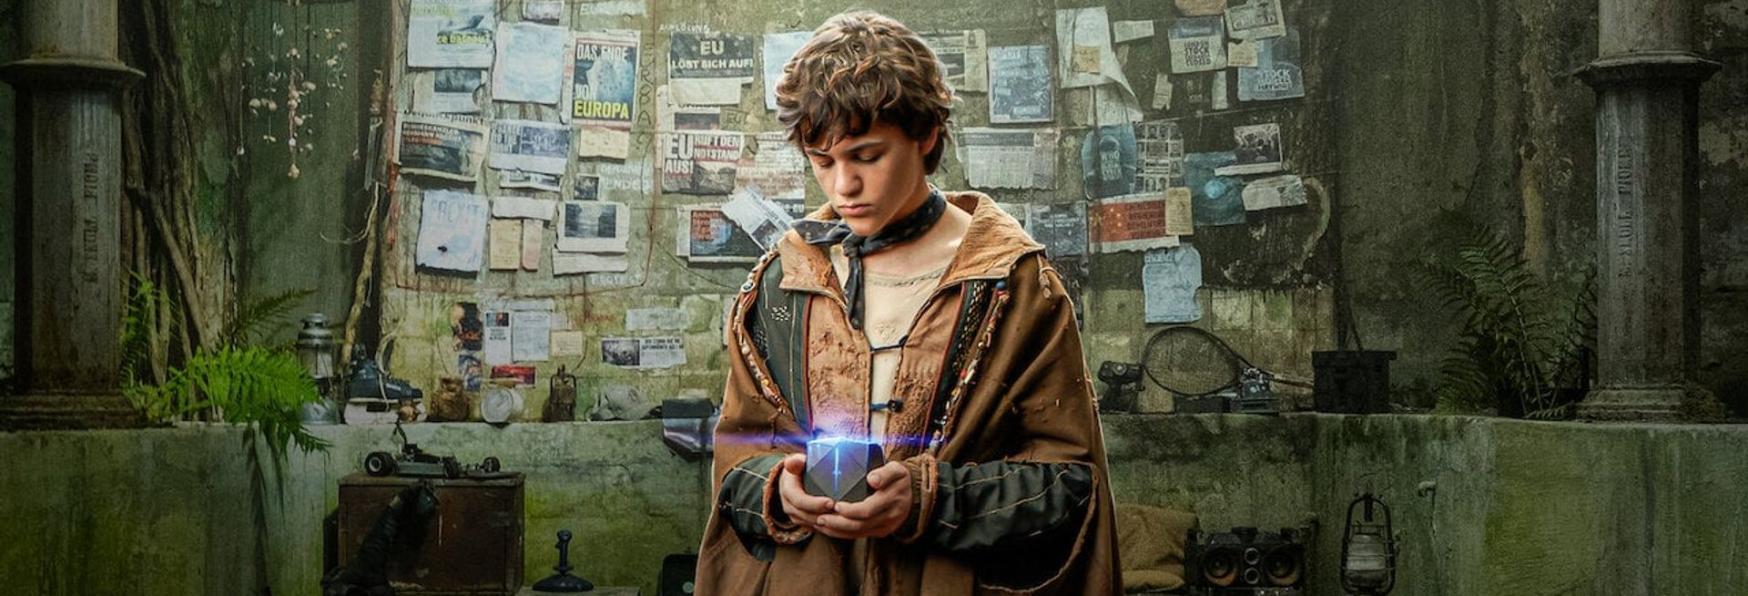 Tribes of Europa: Trama, Cast, Trailer e Data della nuova Serie TV targata Netflix